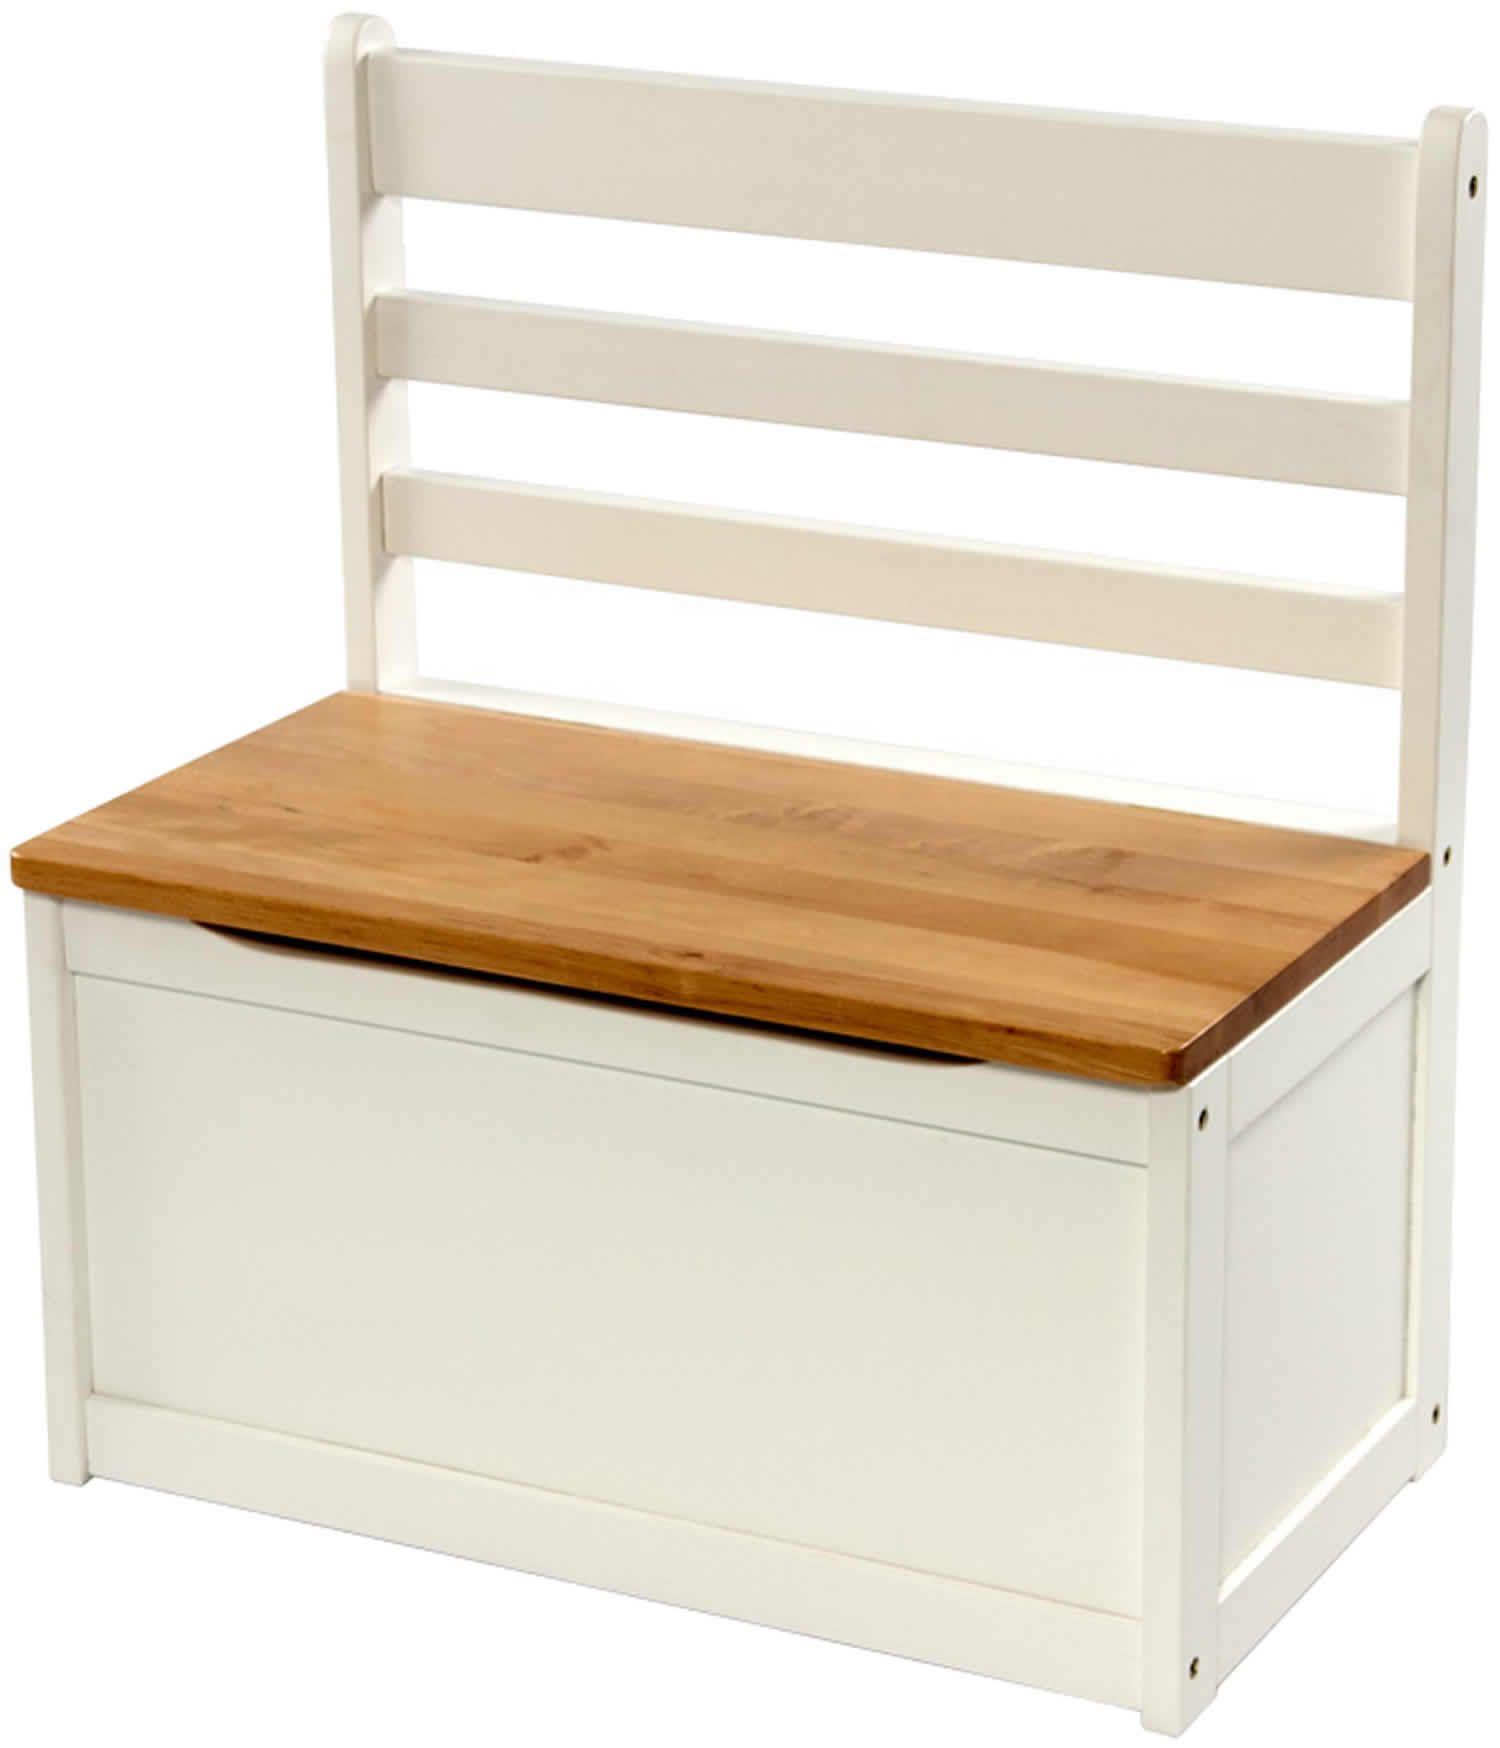 Selbstgemachte Möbel · Holzbänke · Spielzeugtruhe · Kinder Sitzbank  Holzbank Truhenbank Truhe Spielzeugbox